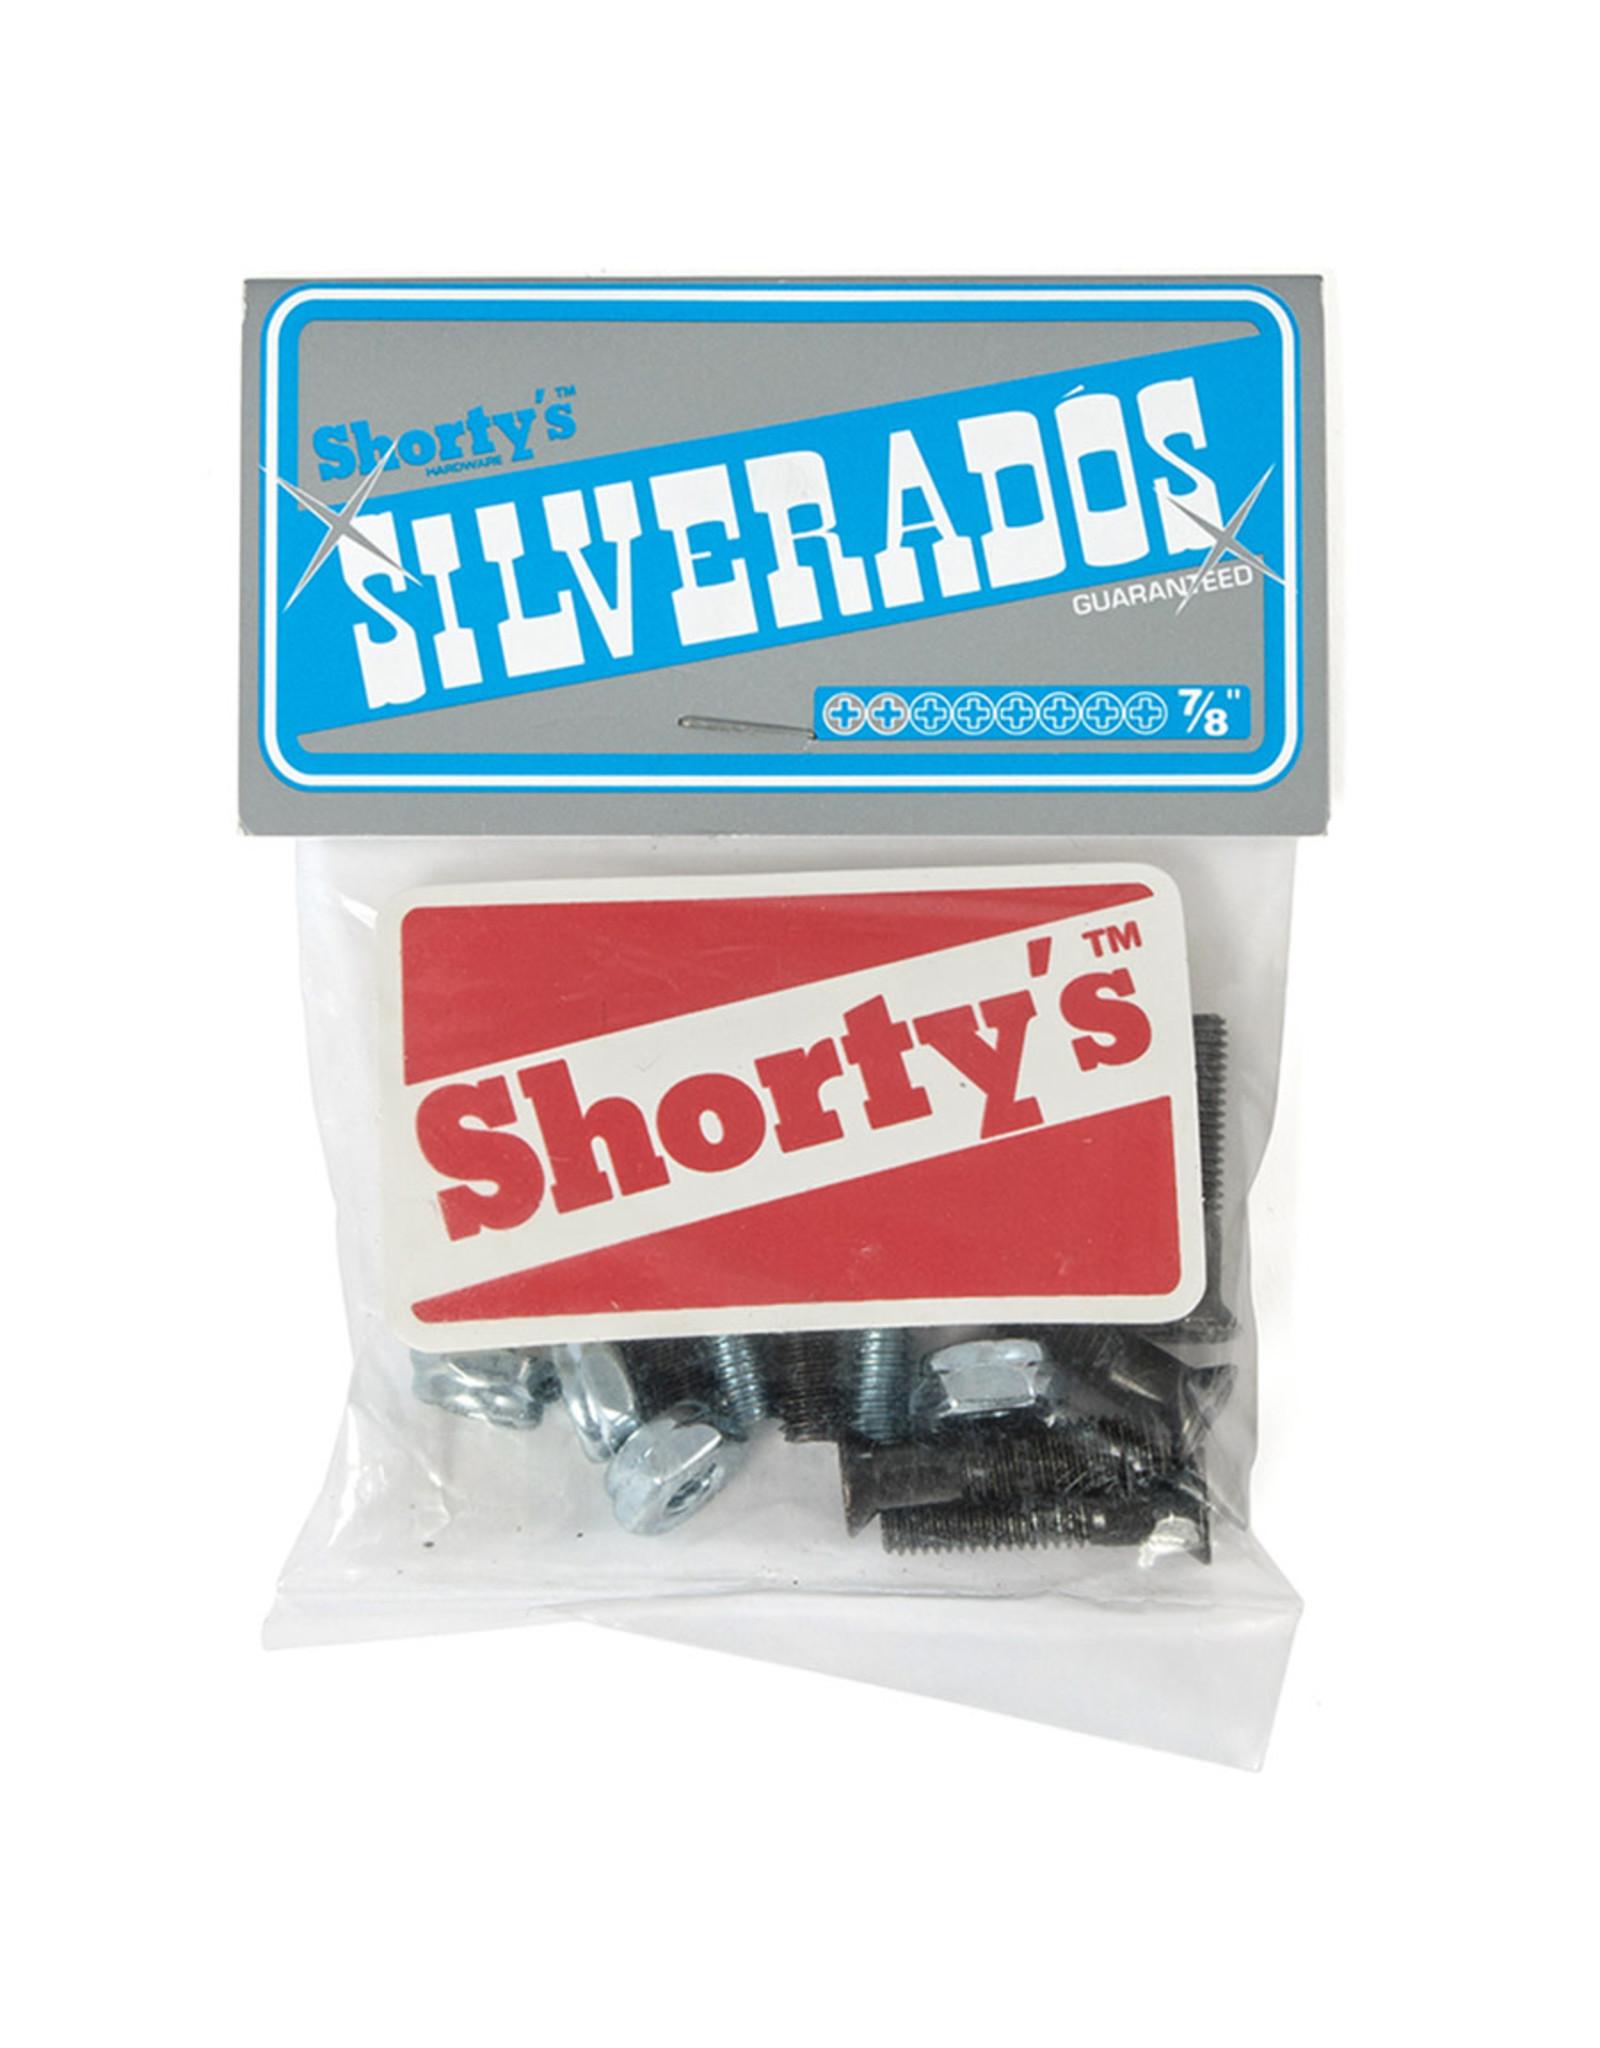 "Shorty's Shortys Silverado Hardware Phillips (7/8"")"